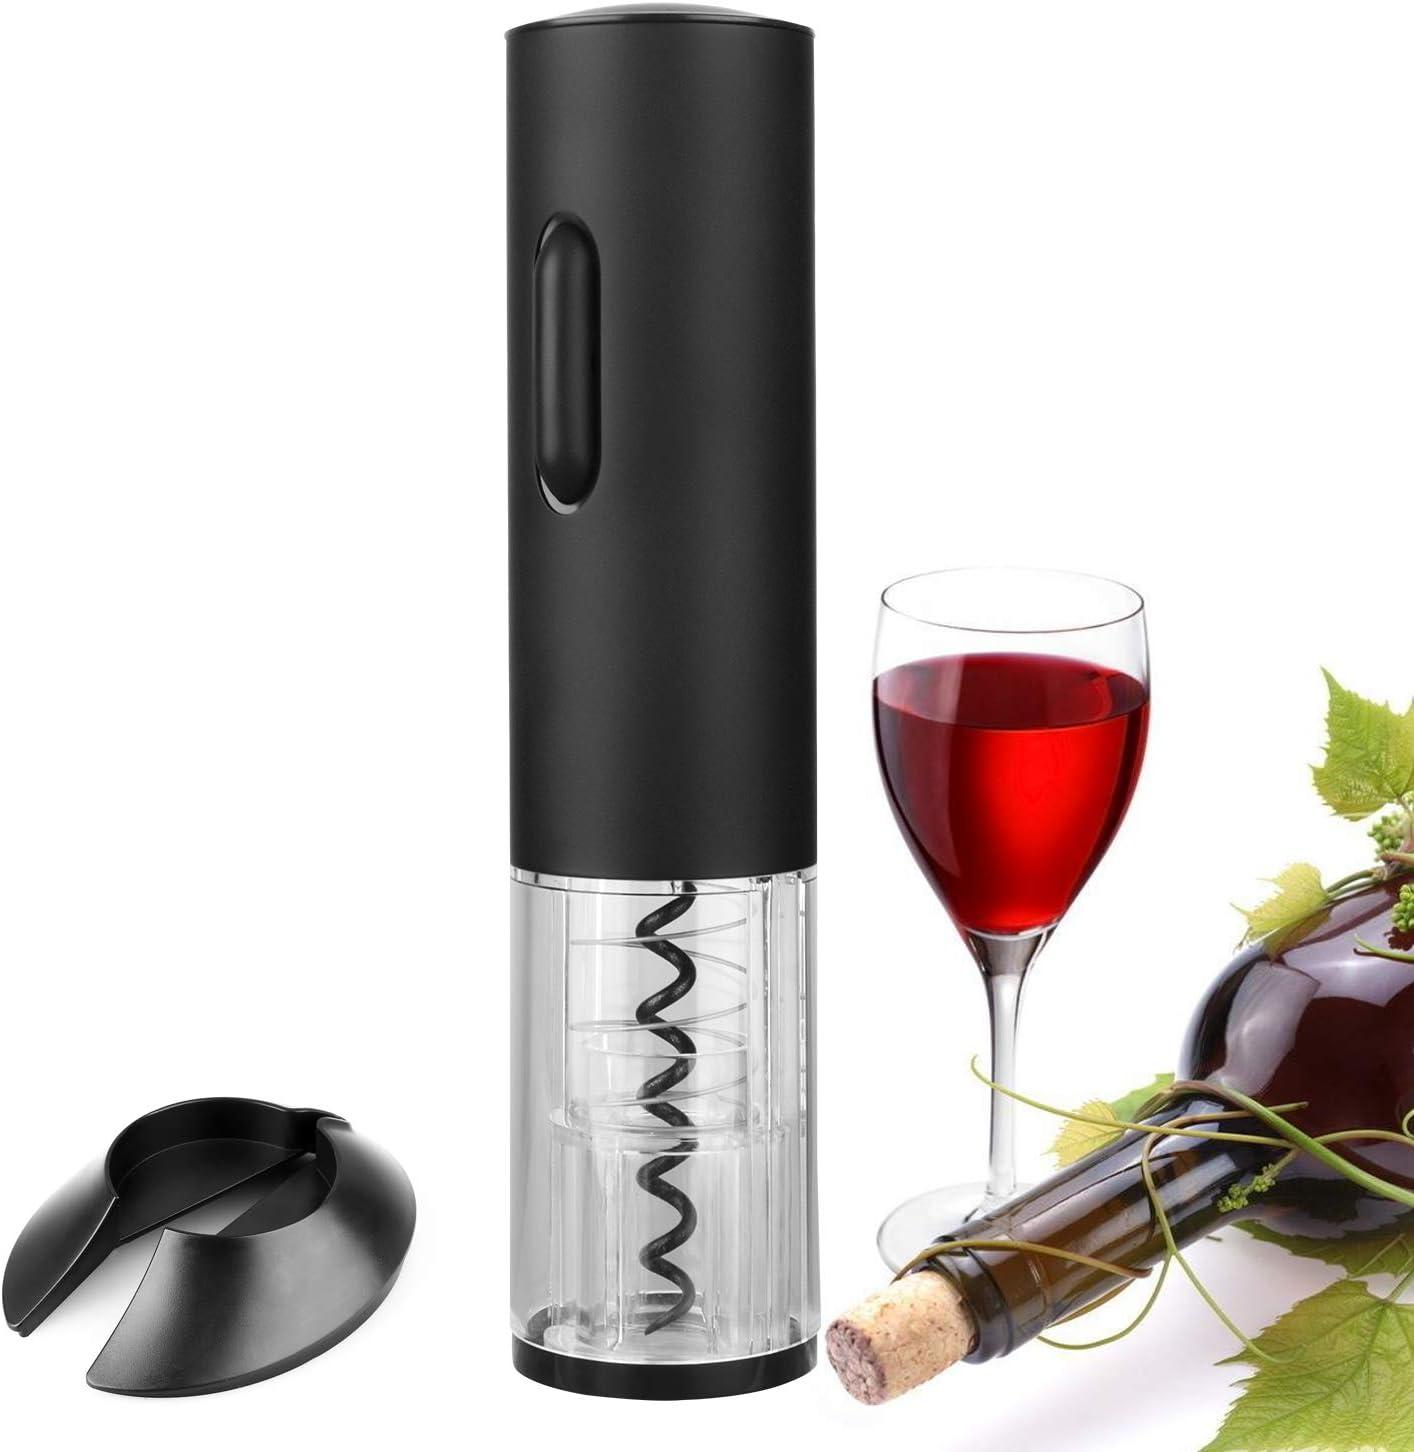 Electric Automatic Wine Bottle Opener Corkscrew Opener W// Foil Cutter LED Light